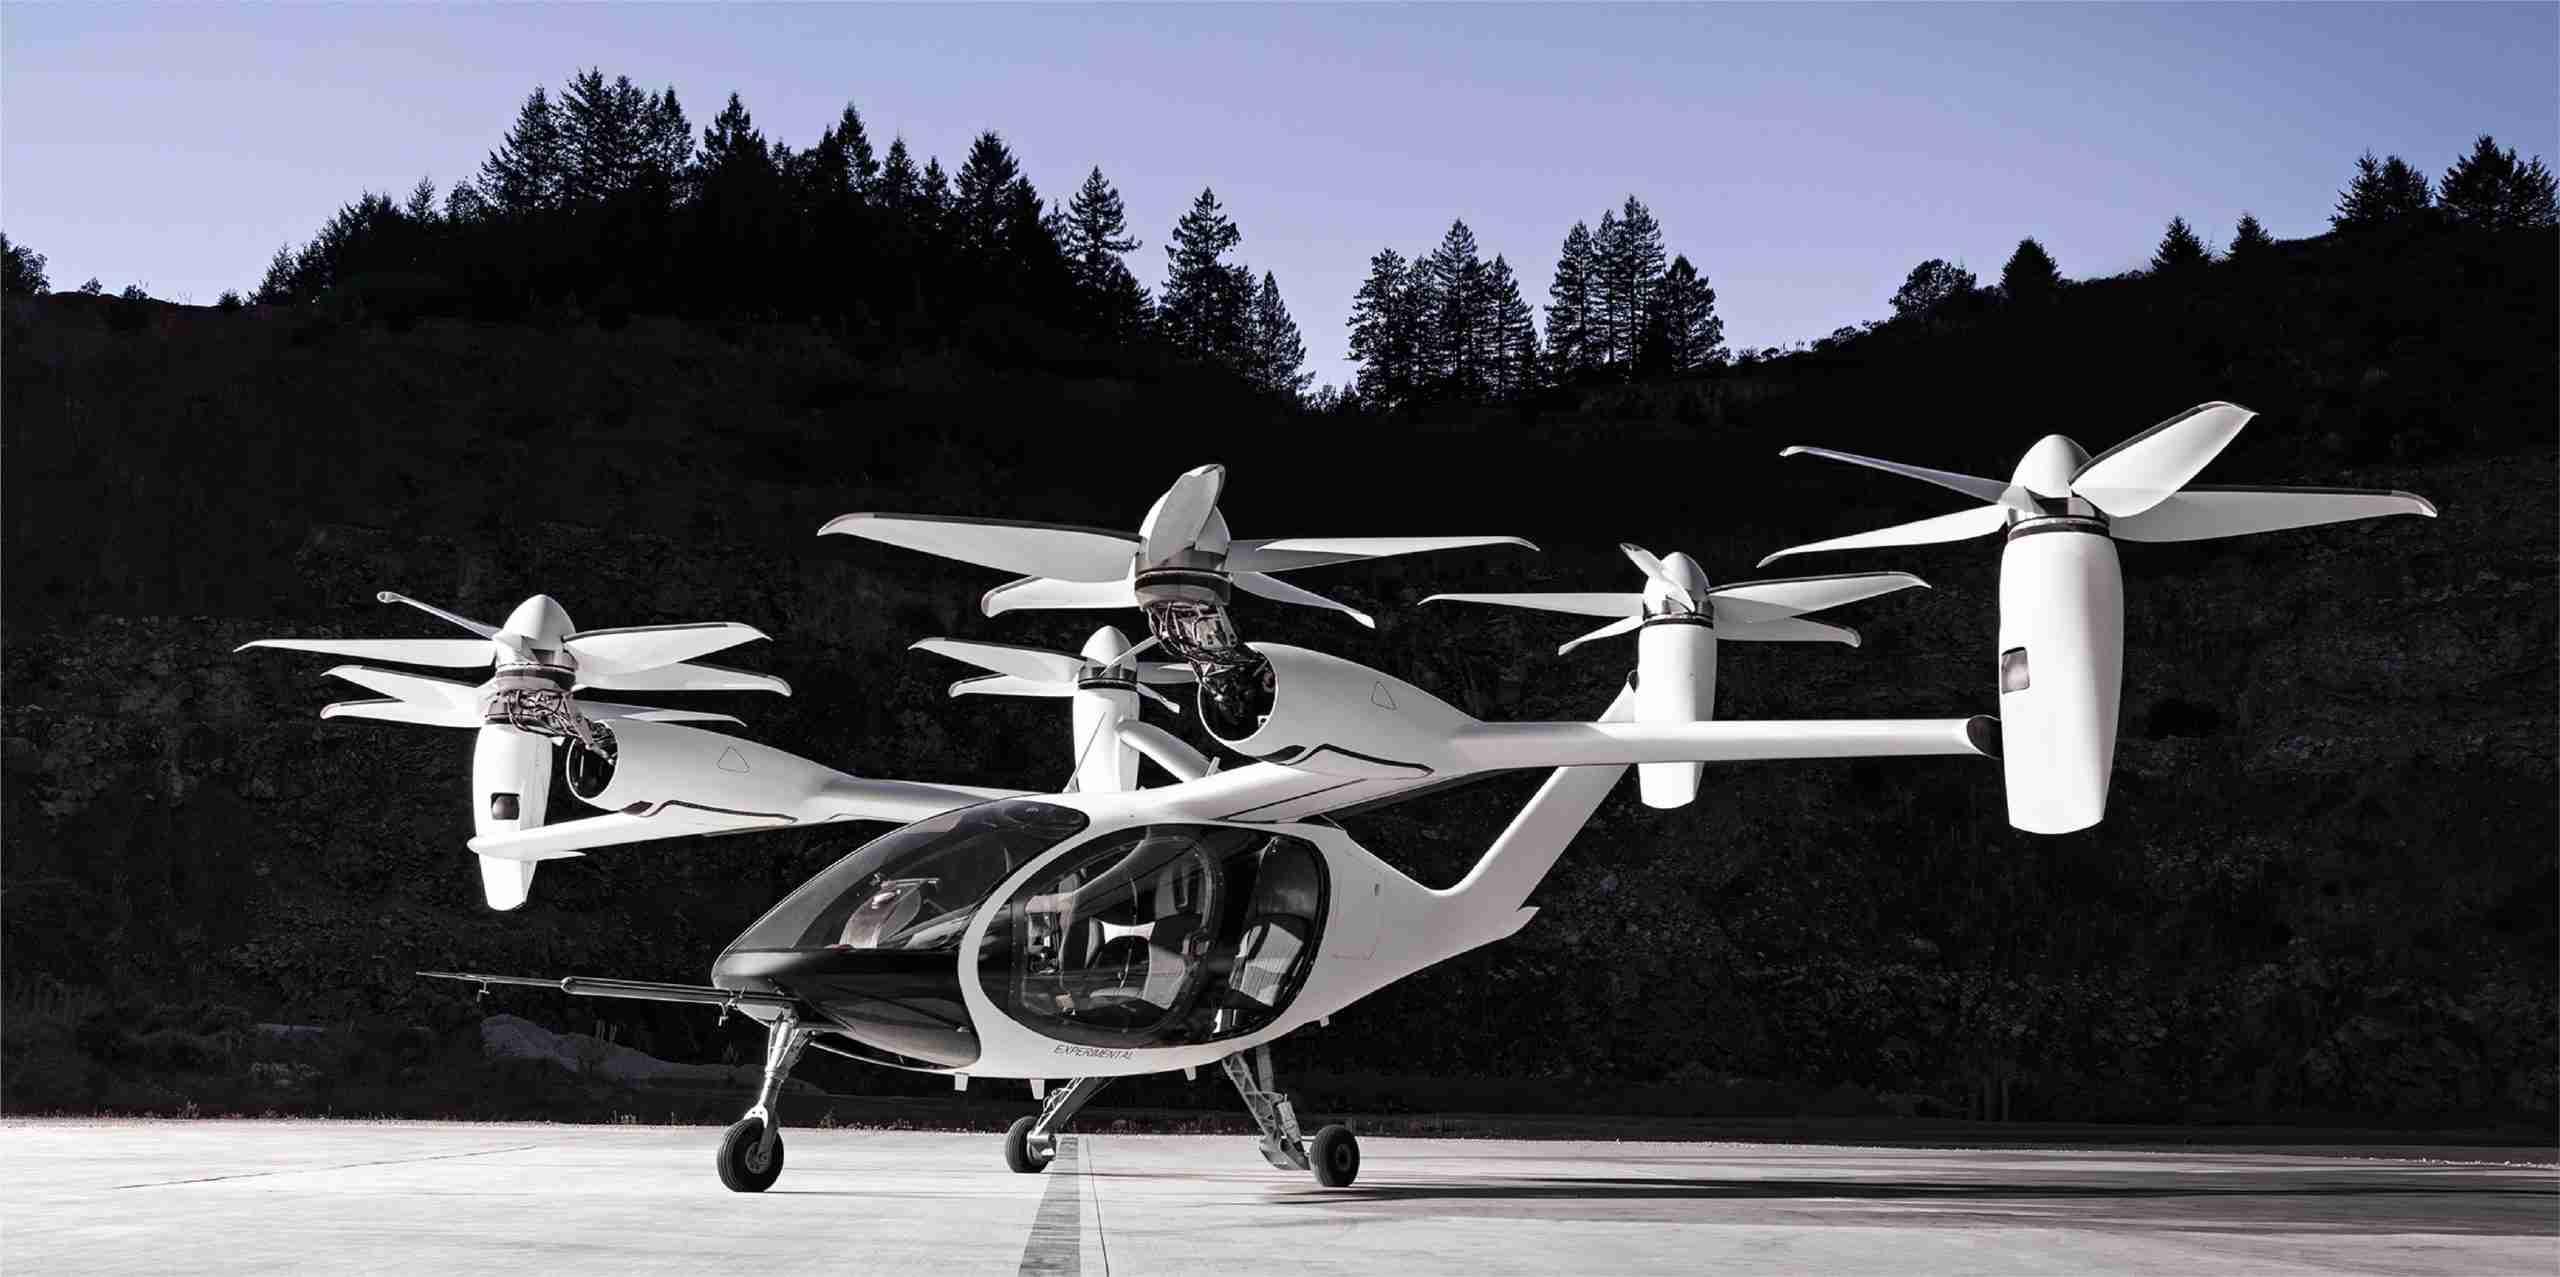 Joby Aviation Selects G3000 for Revolutionary eVTOL Aircraft